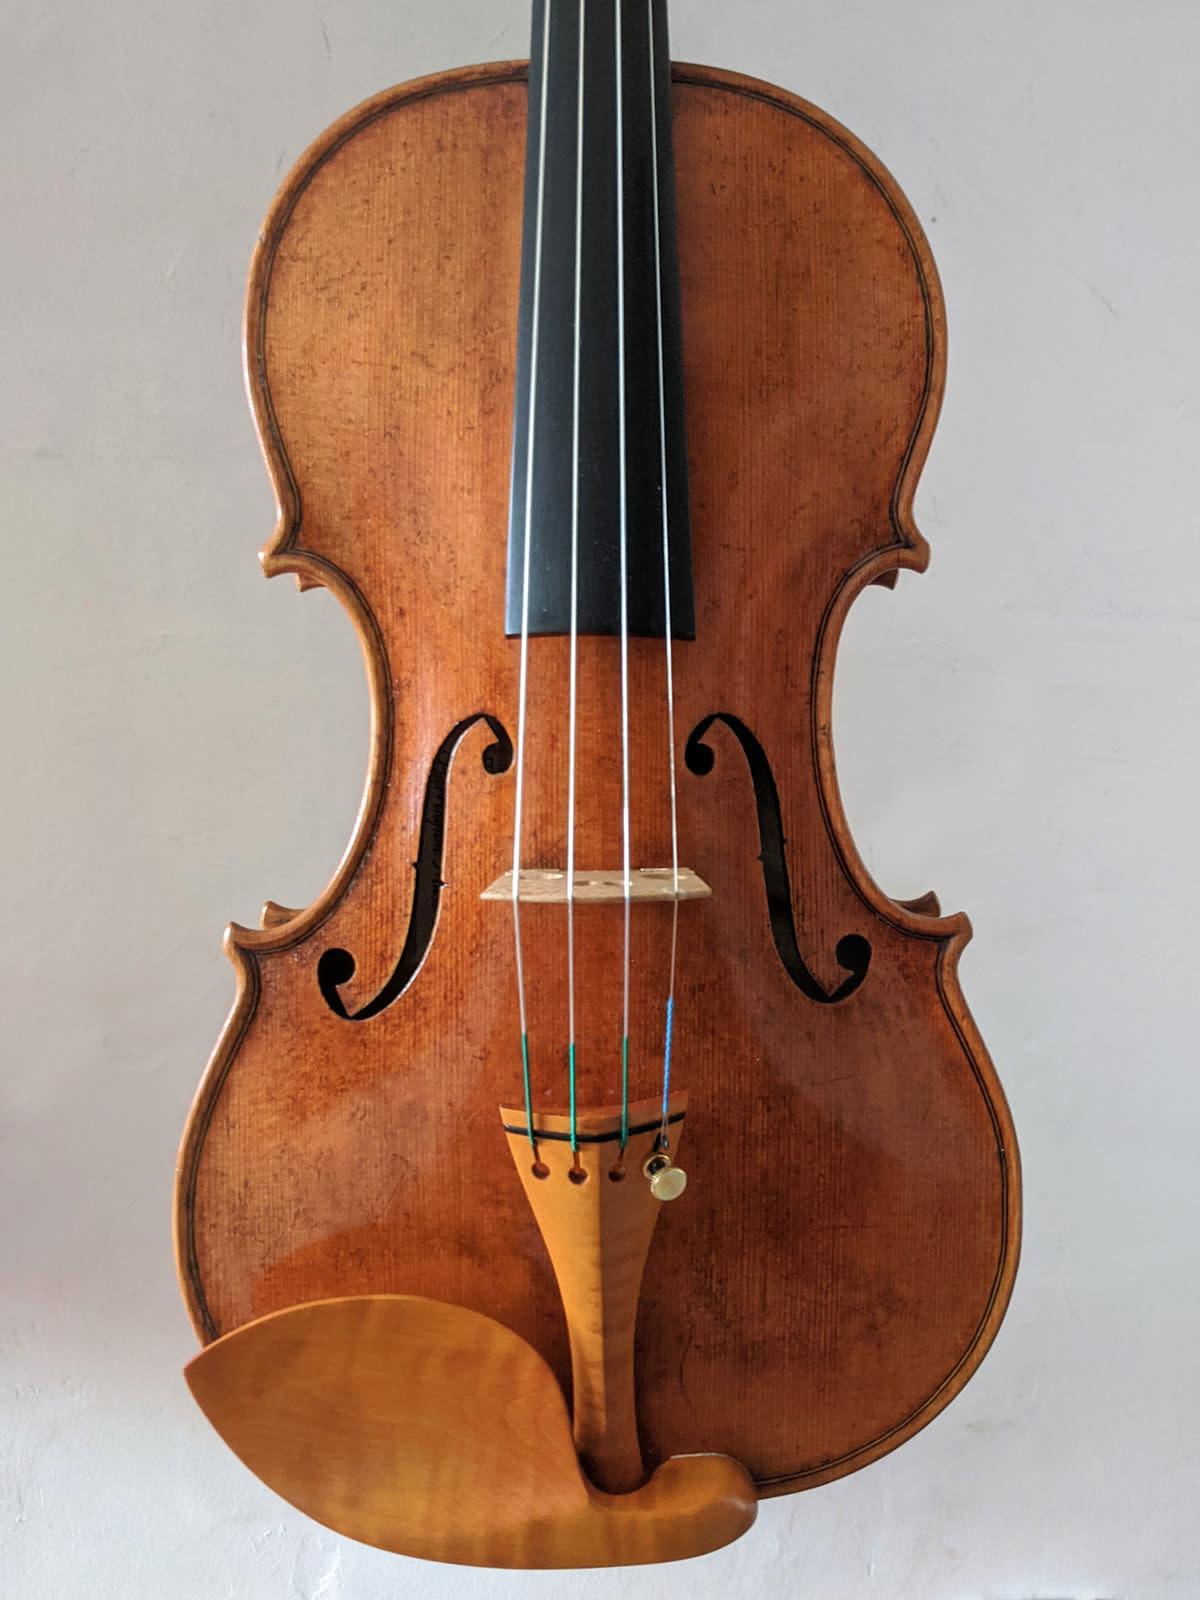 Francis Morris violin, Lord Wilton Guarneri model, highly antiqued, 2020, Great Barrington, MA, USA